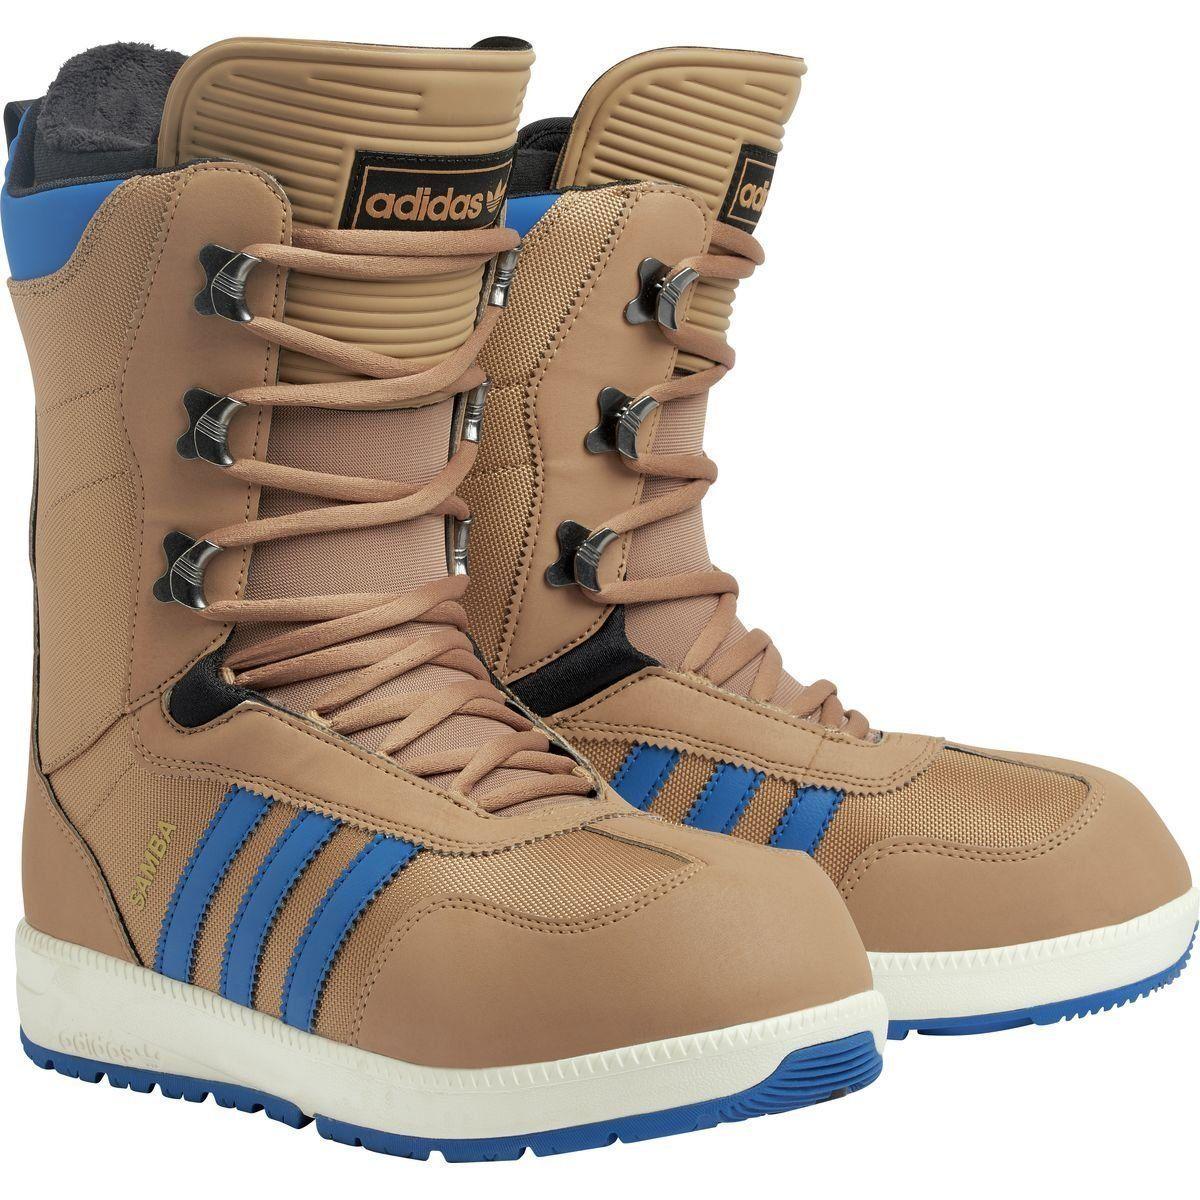 finest selection c96e3 a476f Adidas Samba Snowboard Boots